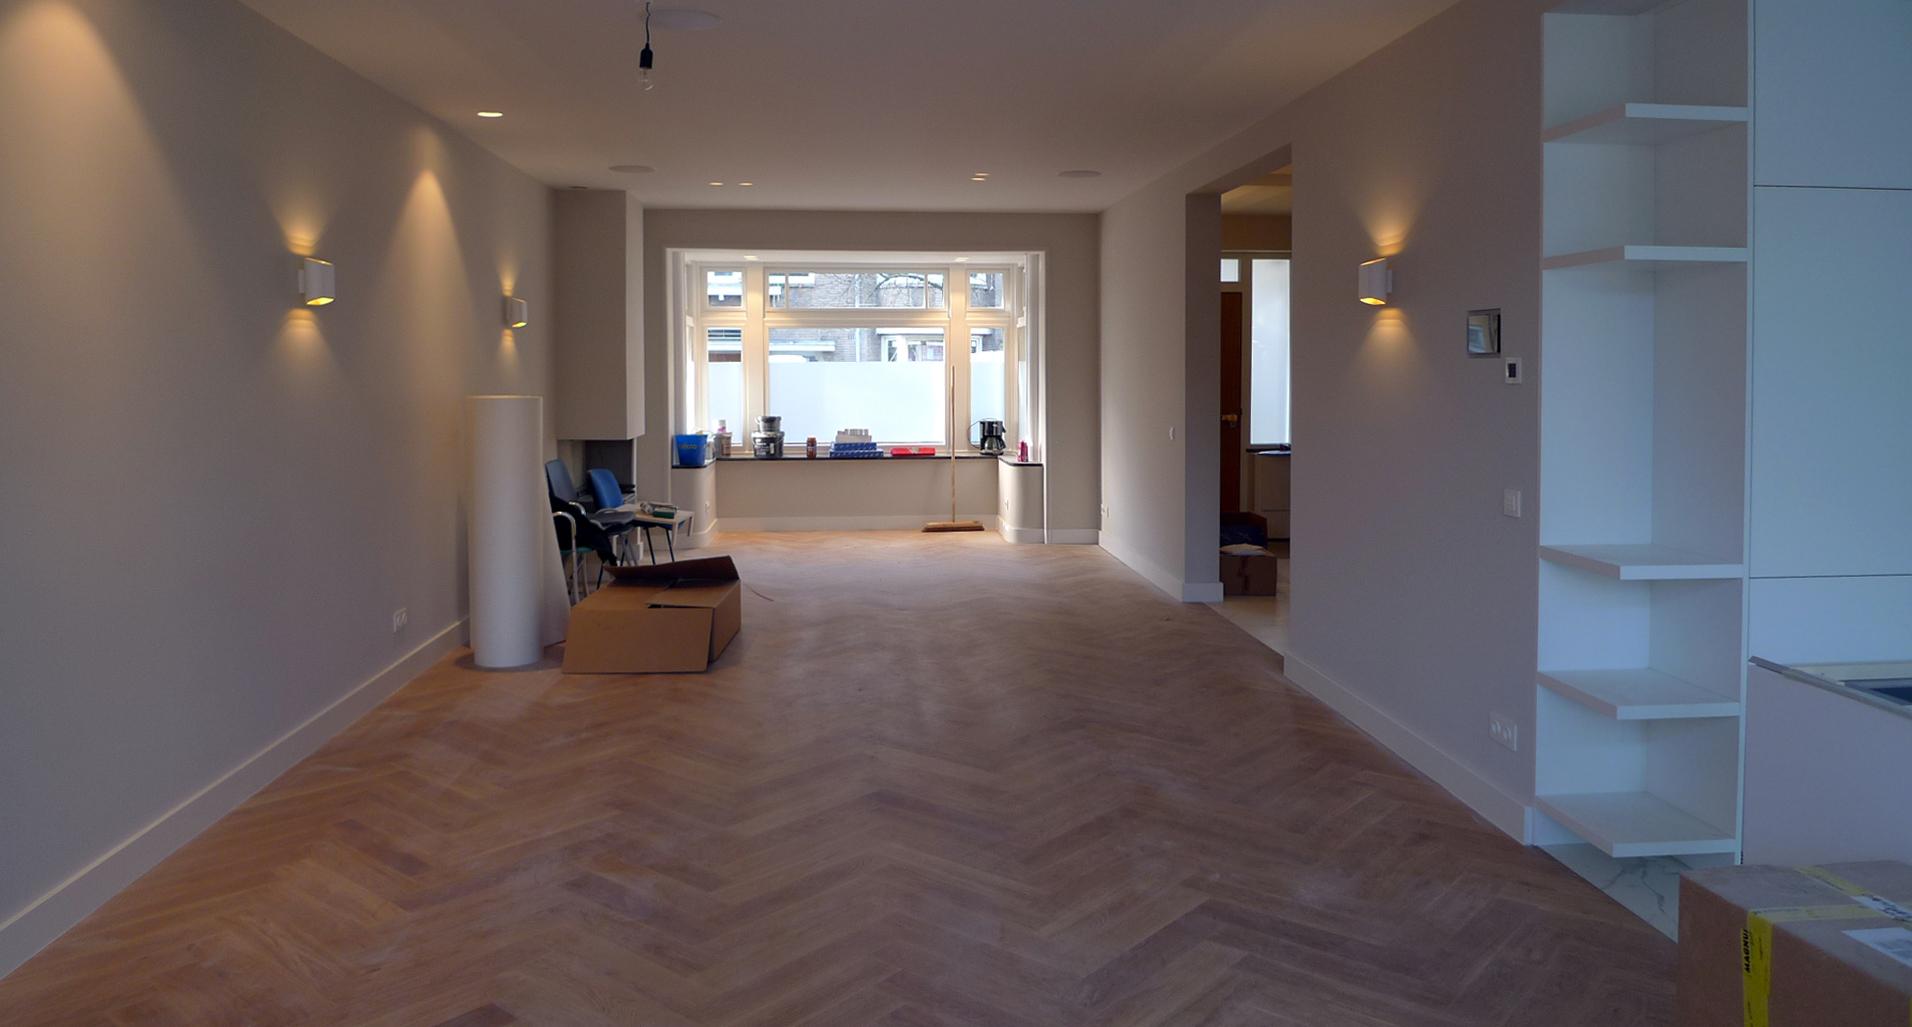 Badkamer Verbouwen Amsterdam : Verbouwing woonhuis amsterdam u2013 christina fuchs architect